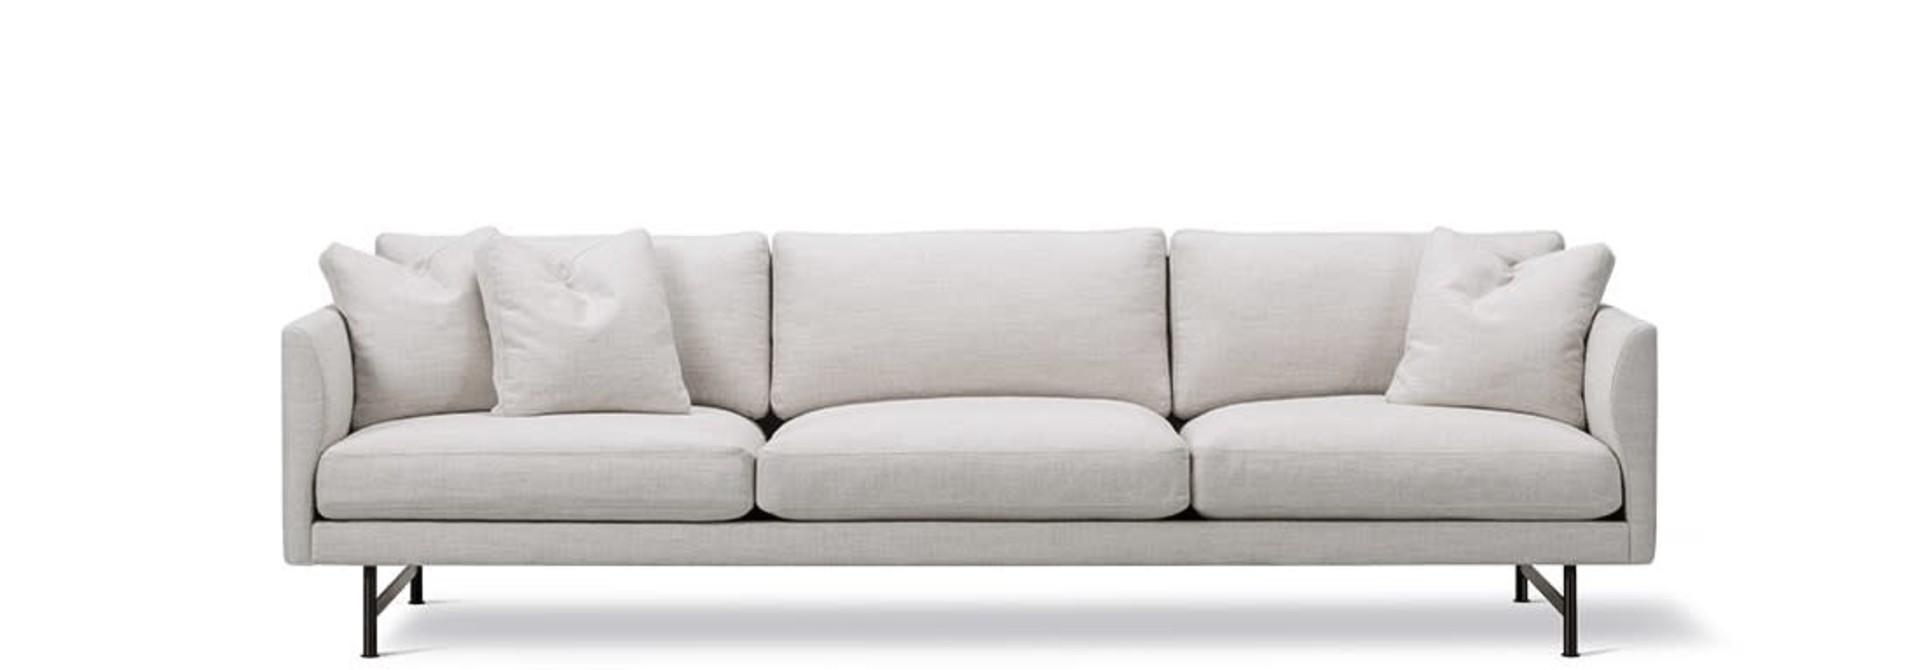 Calmo sofa 3 seater 80 metal